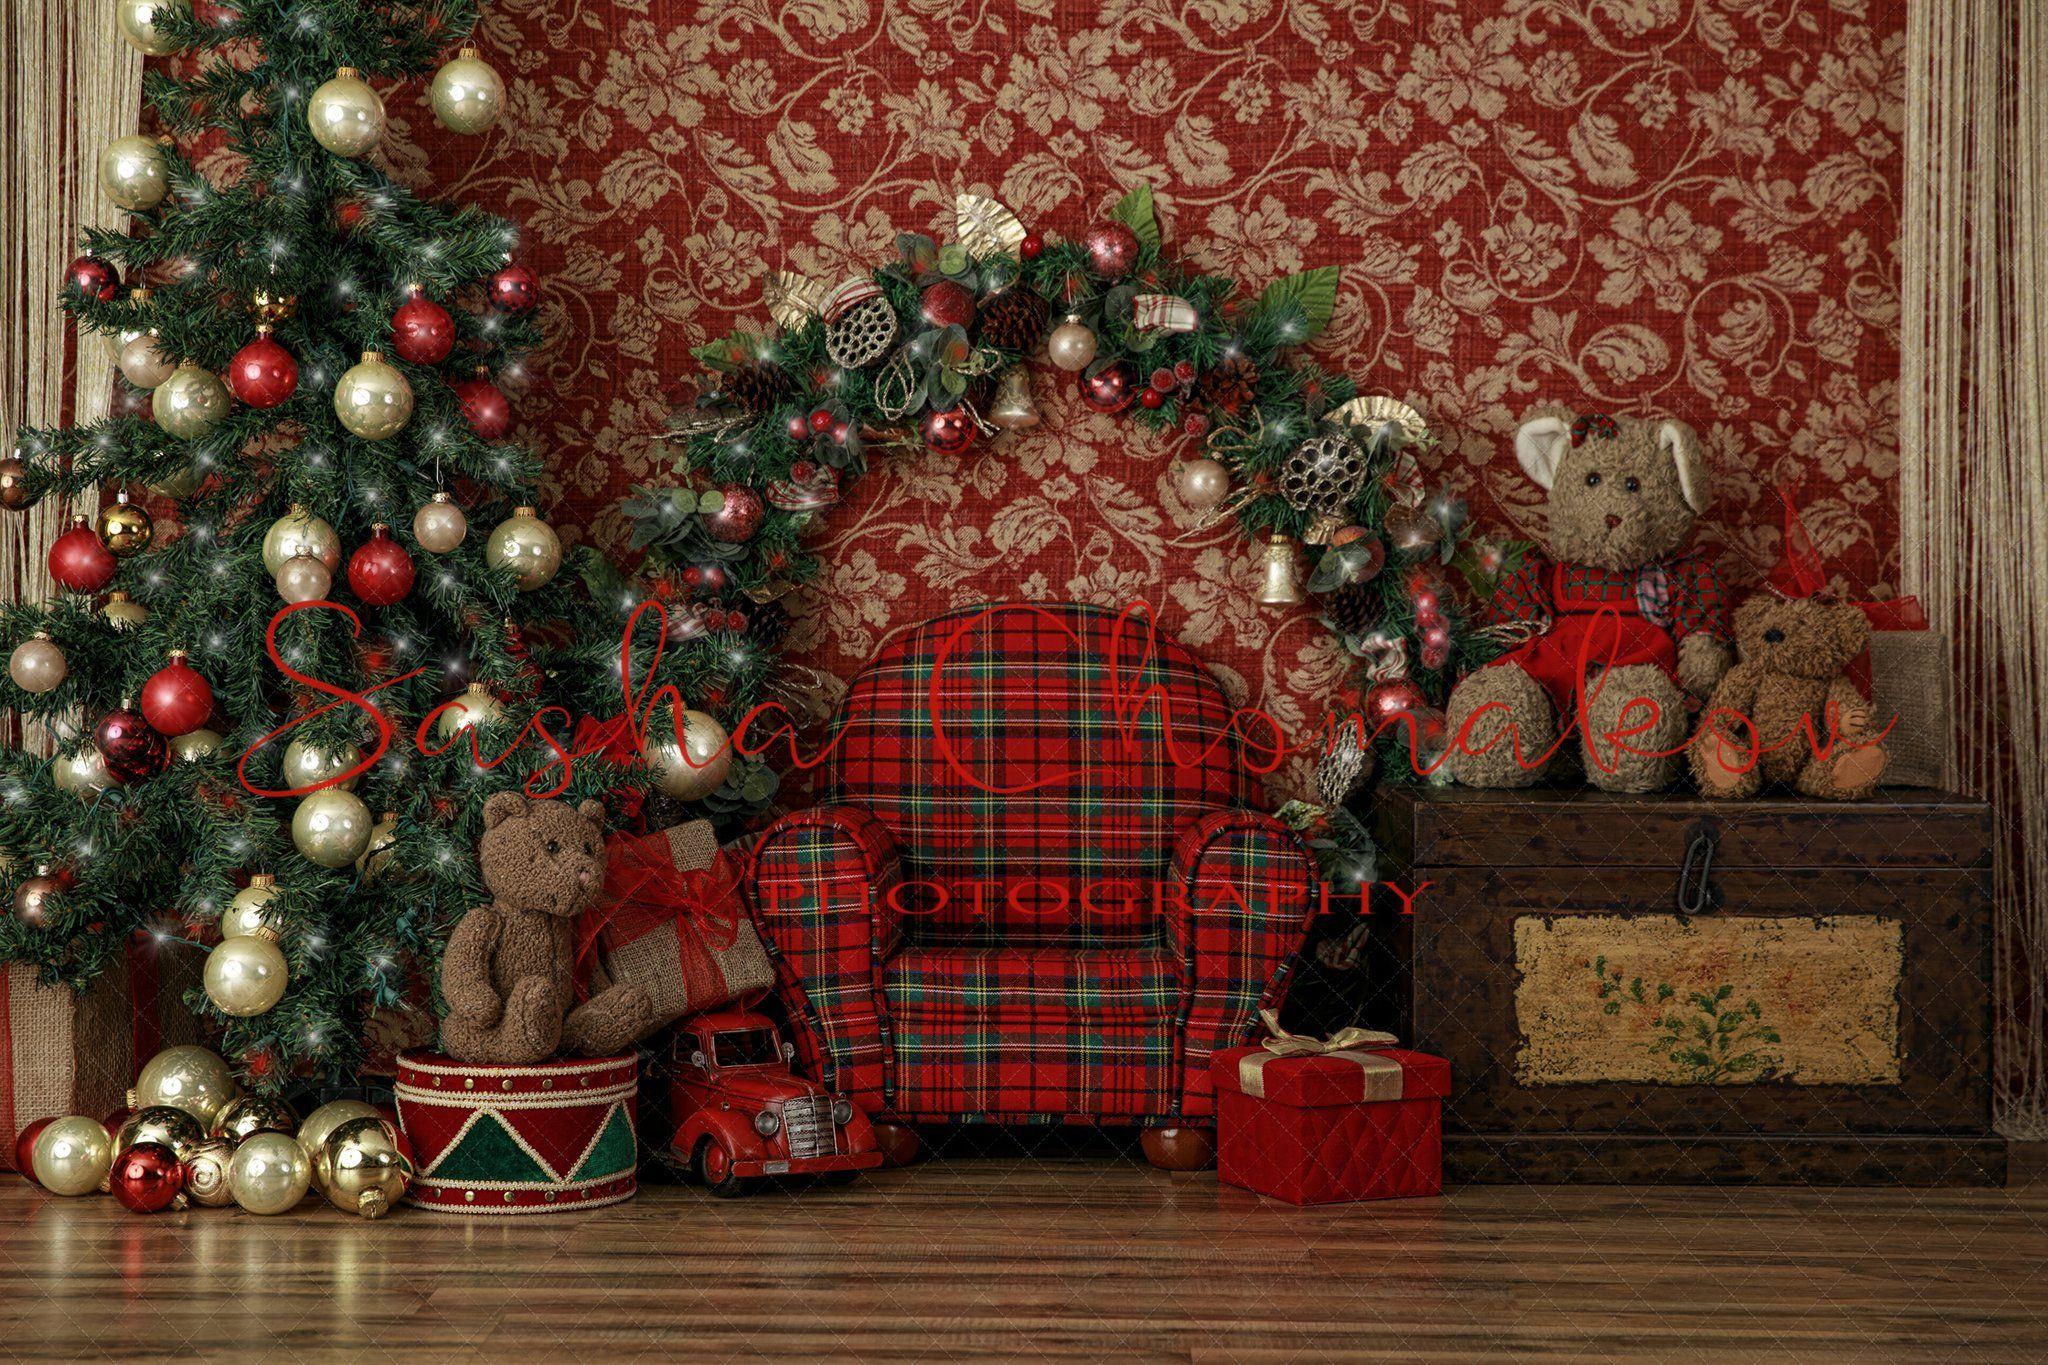 OFILA Rustic Christmas Backdrop 4x6ft Kids Christmas Photos Background Christmas Garland Interior Room Decor Baby Christmas Portraits Christmas Party Decoration Home Photography Studio Props